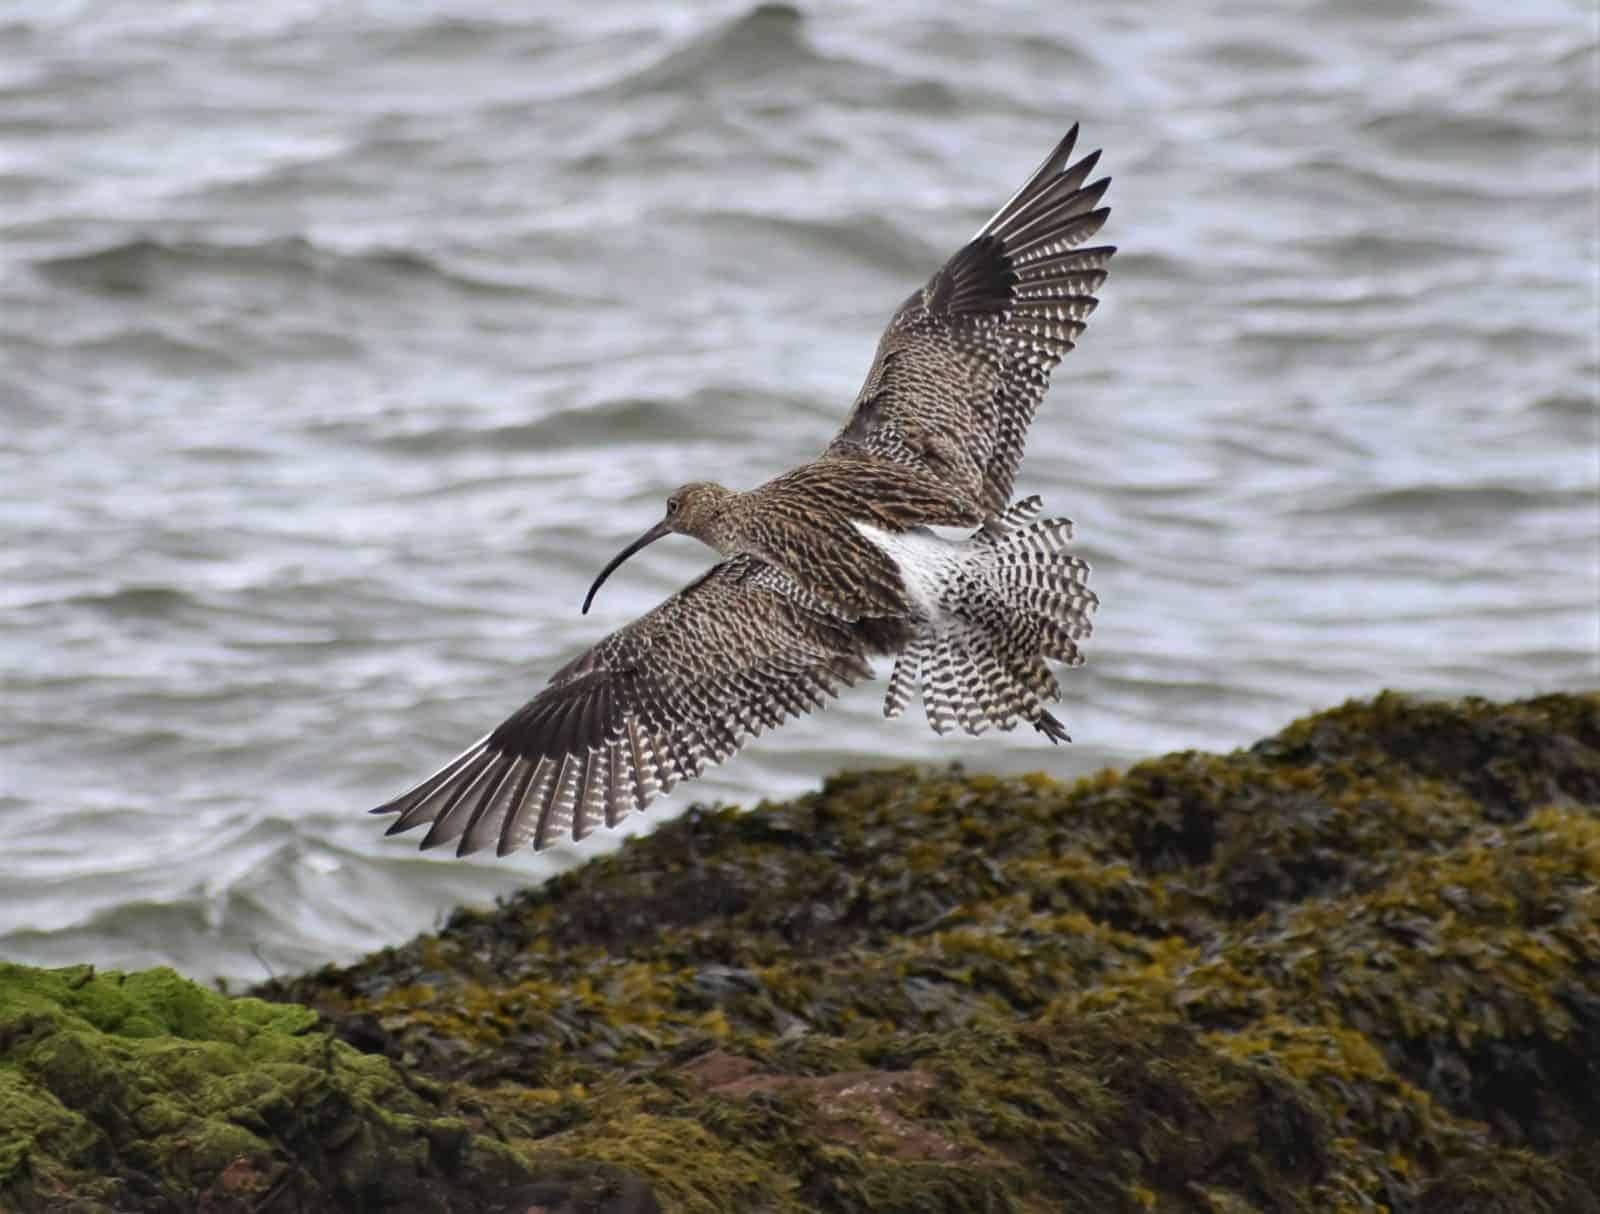 Coastal Bird flying from land